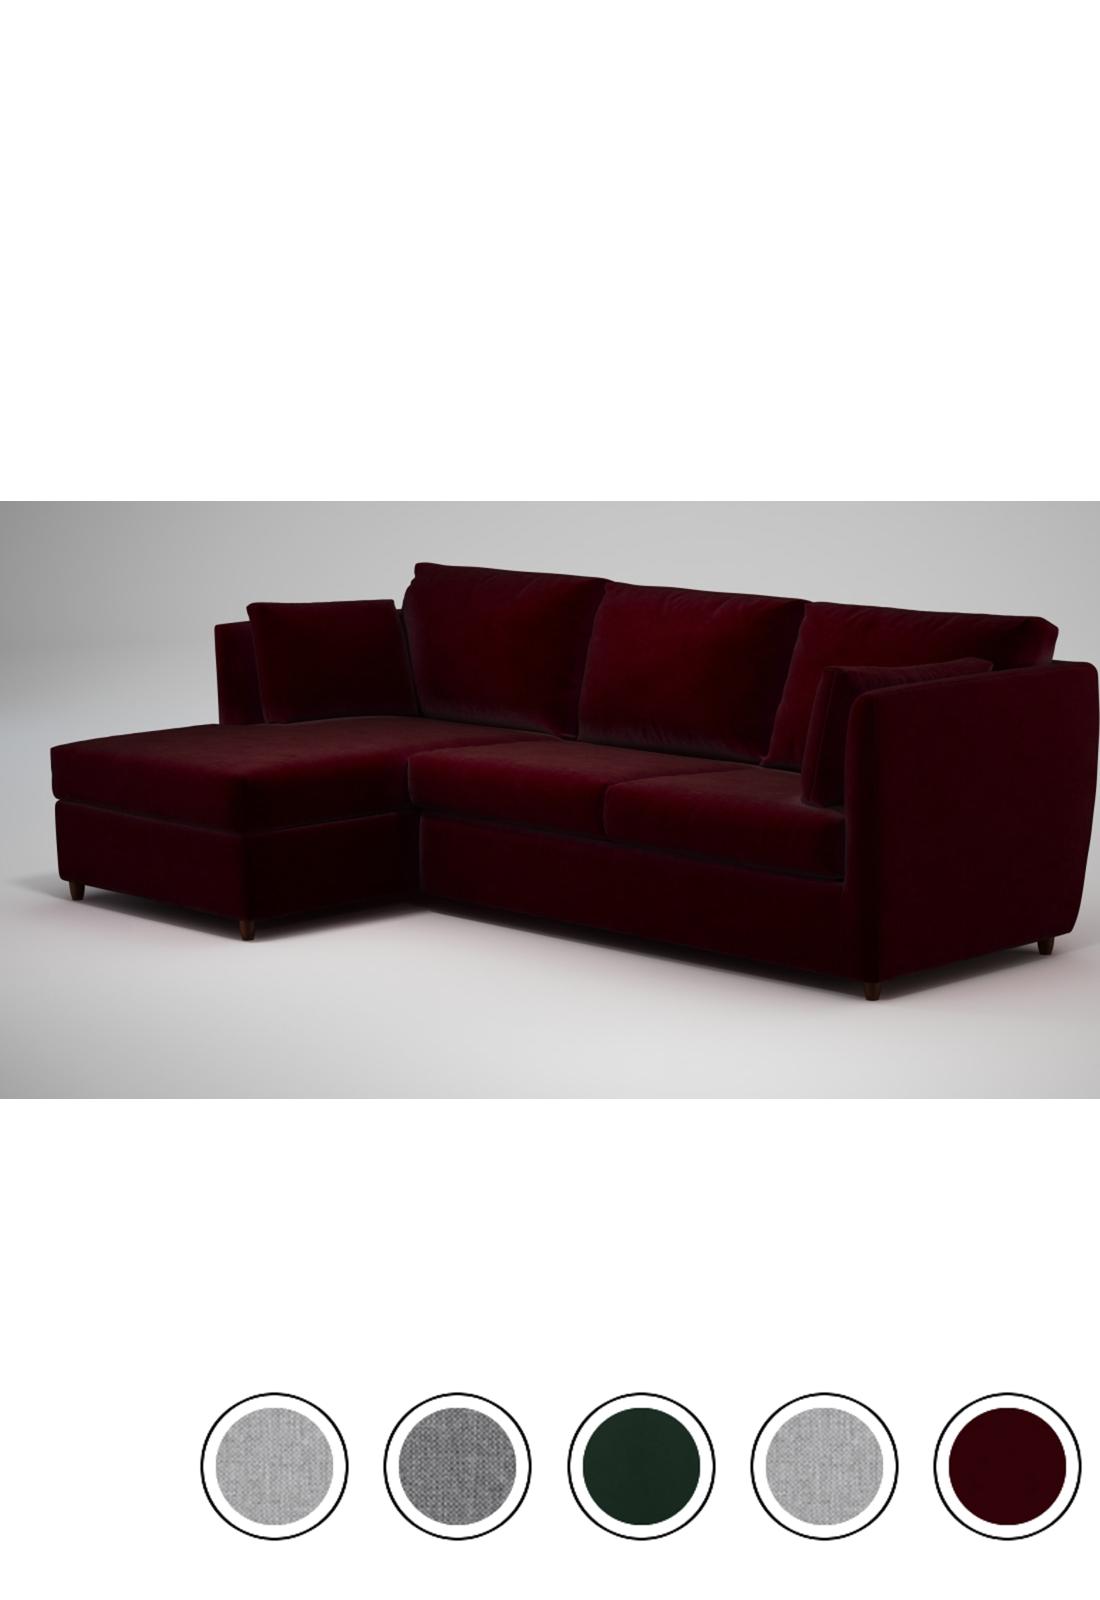 Custom MADE Milner Left Hand Facing Corner Storage Sofa